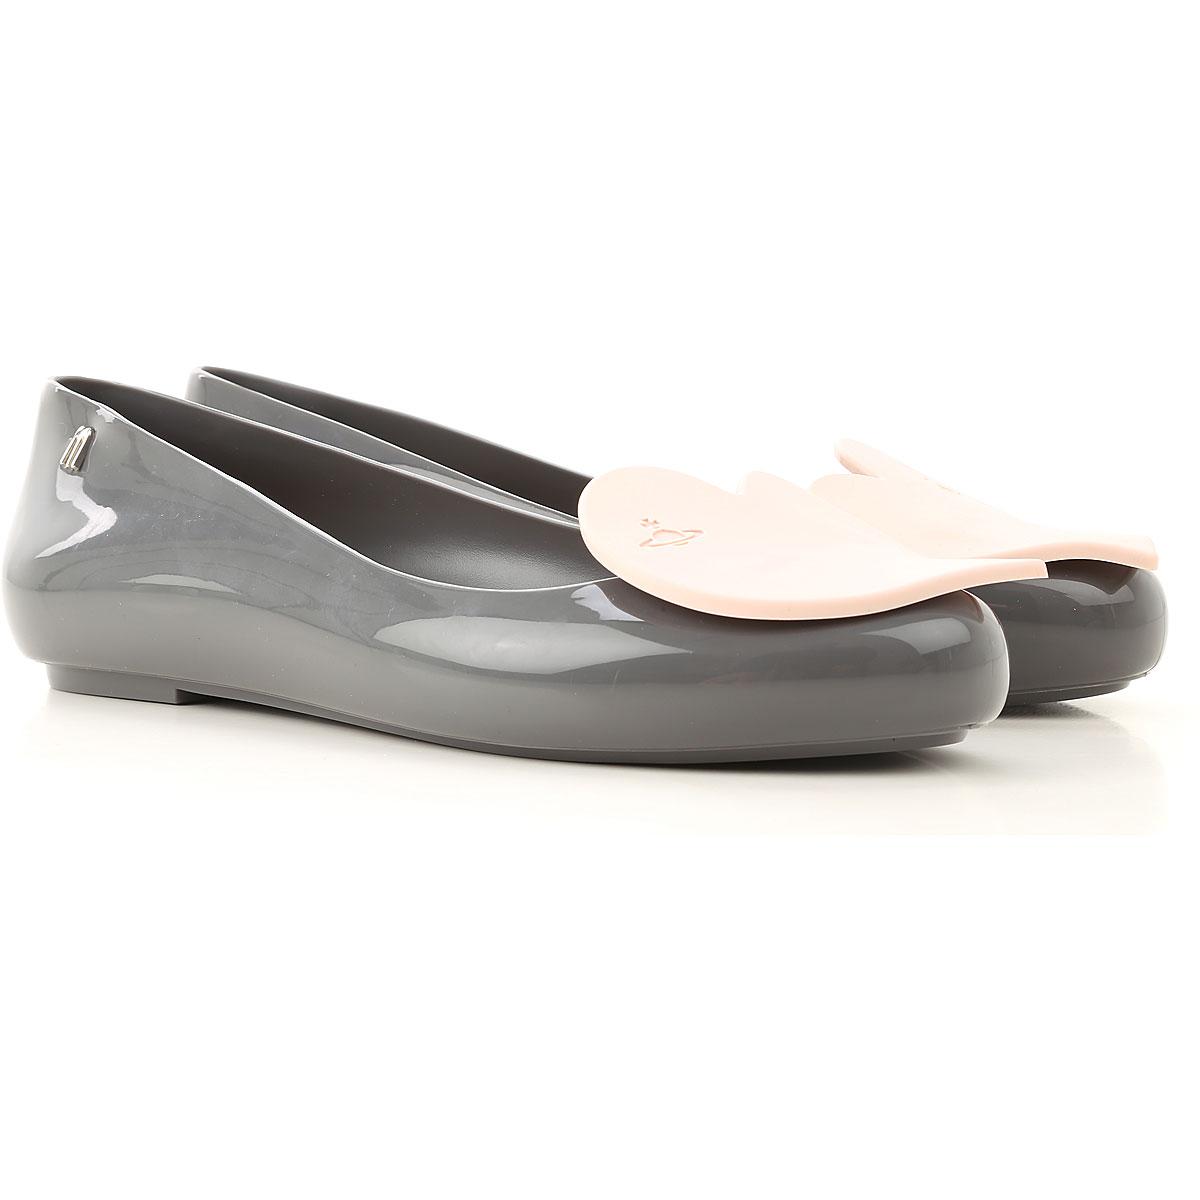 Melissa Ballet Flats Ballerina Shoes for Women On Sale, Dark Grey, PVC, 2019, USA 5 - EUR 35/36 USA 6 - EUR 37 USA 7 - EUR 38 USA 8 - EUR 39 USA 9 - E